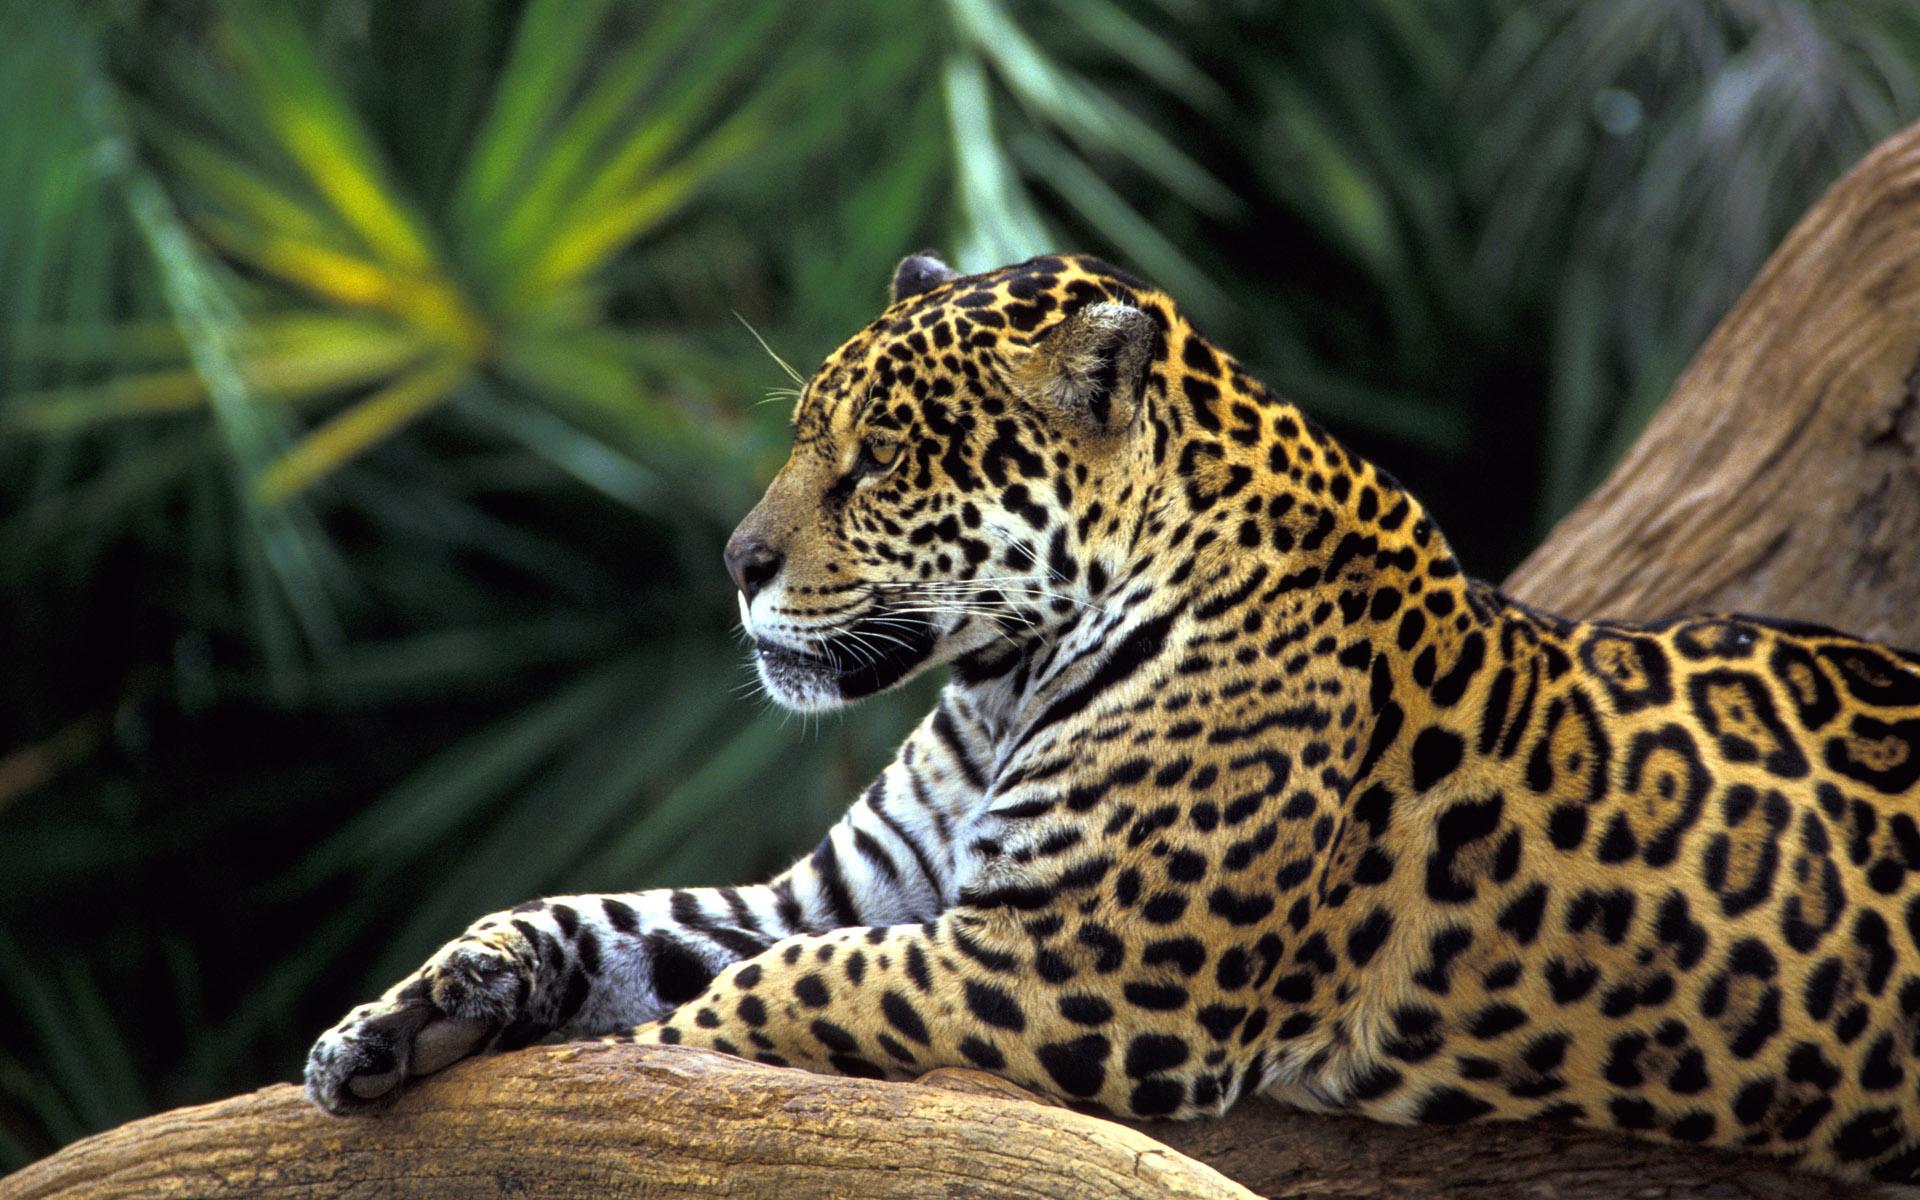 Jaguar in Amazon Rainforest Wallpapers HD Wallpapers 1920x1200